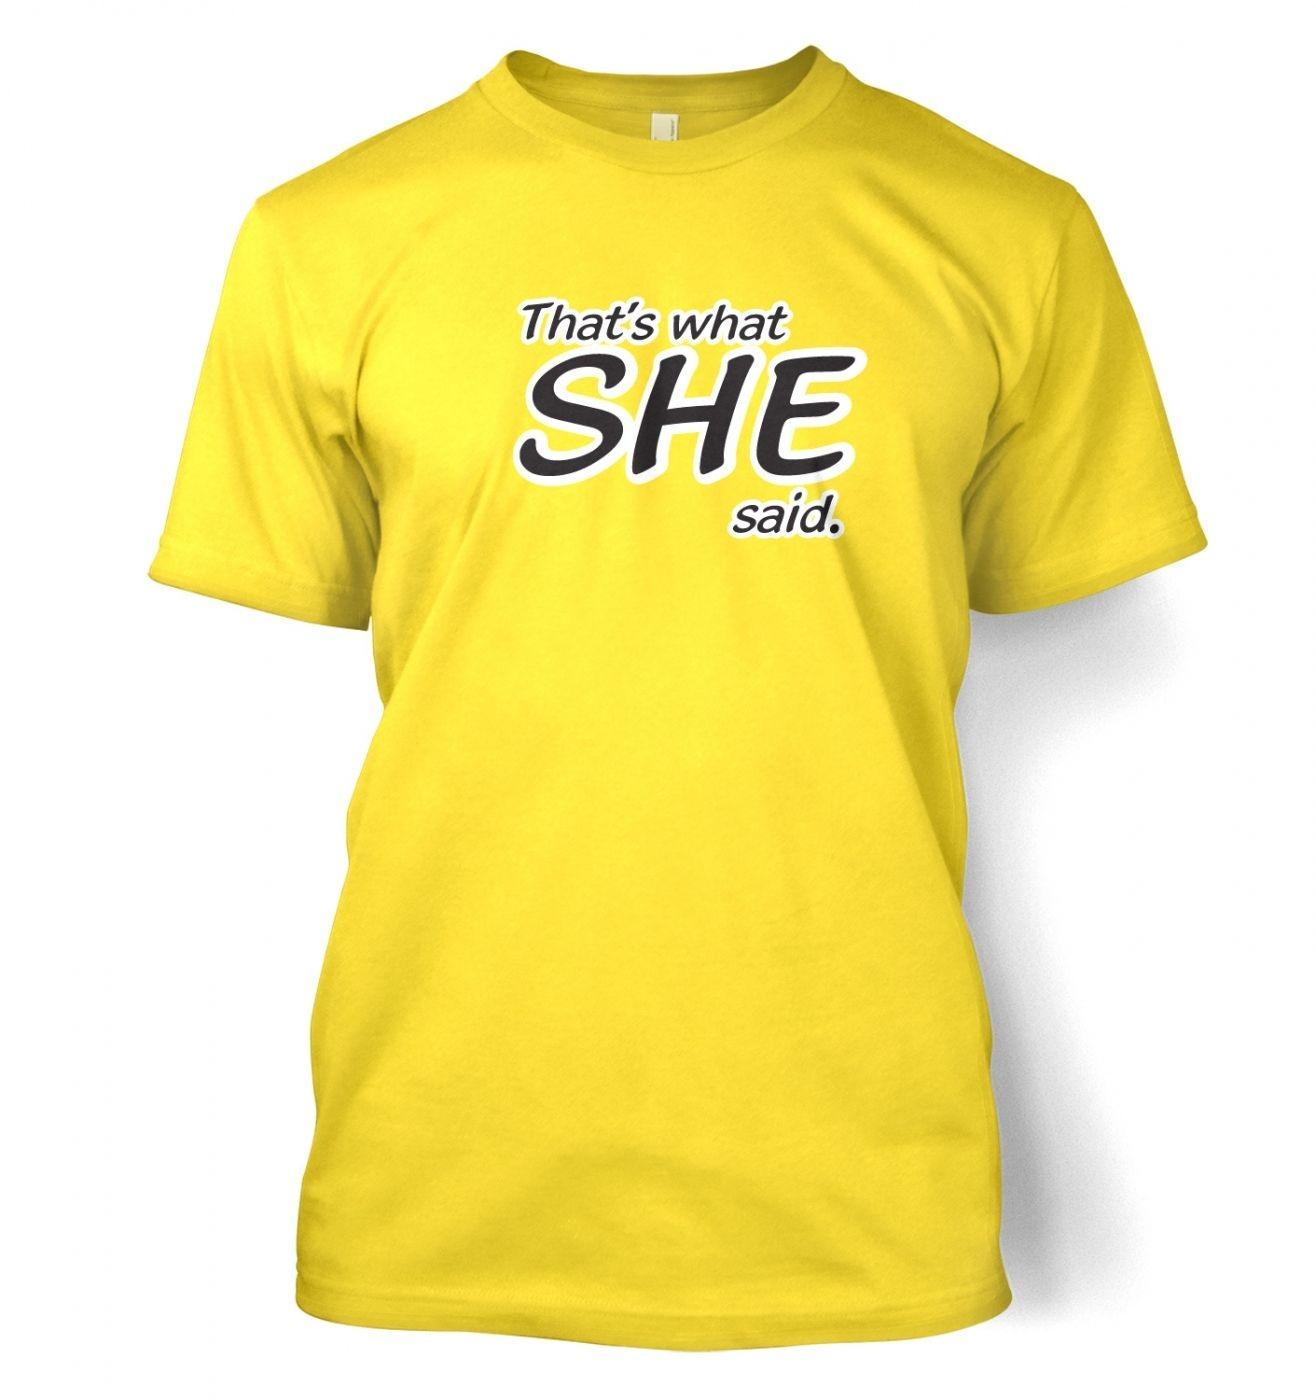 That's What SHE Said men's t-shirt